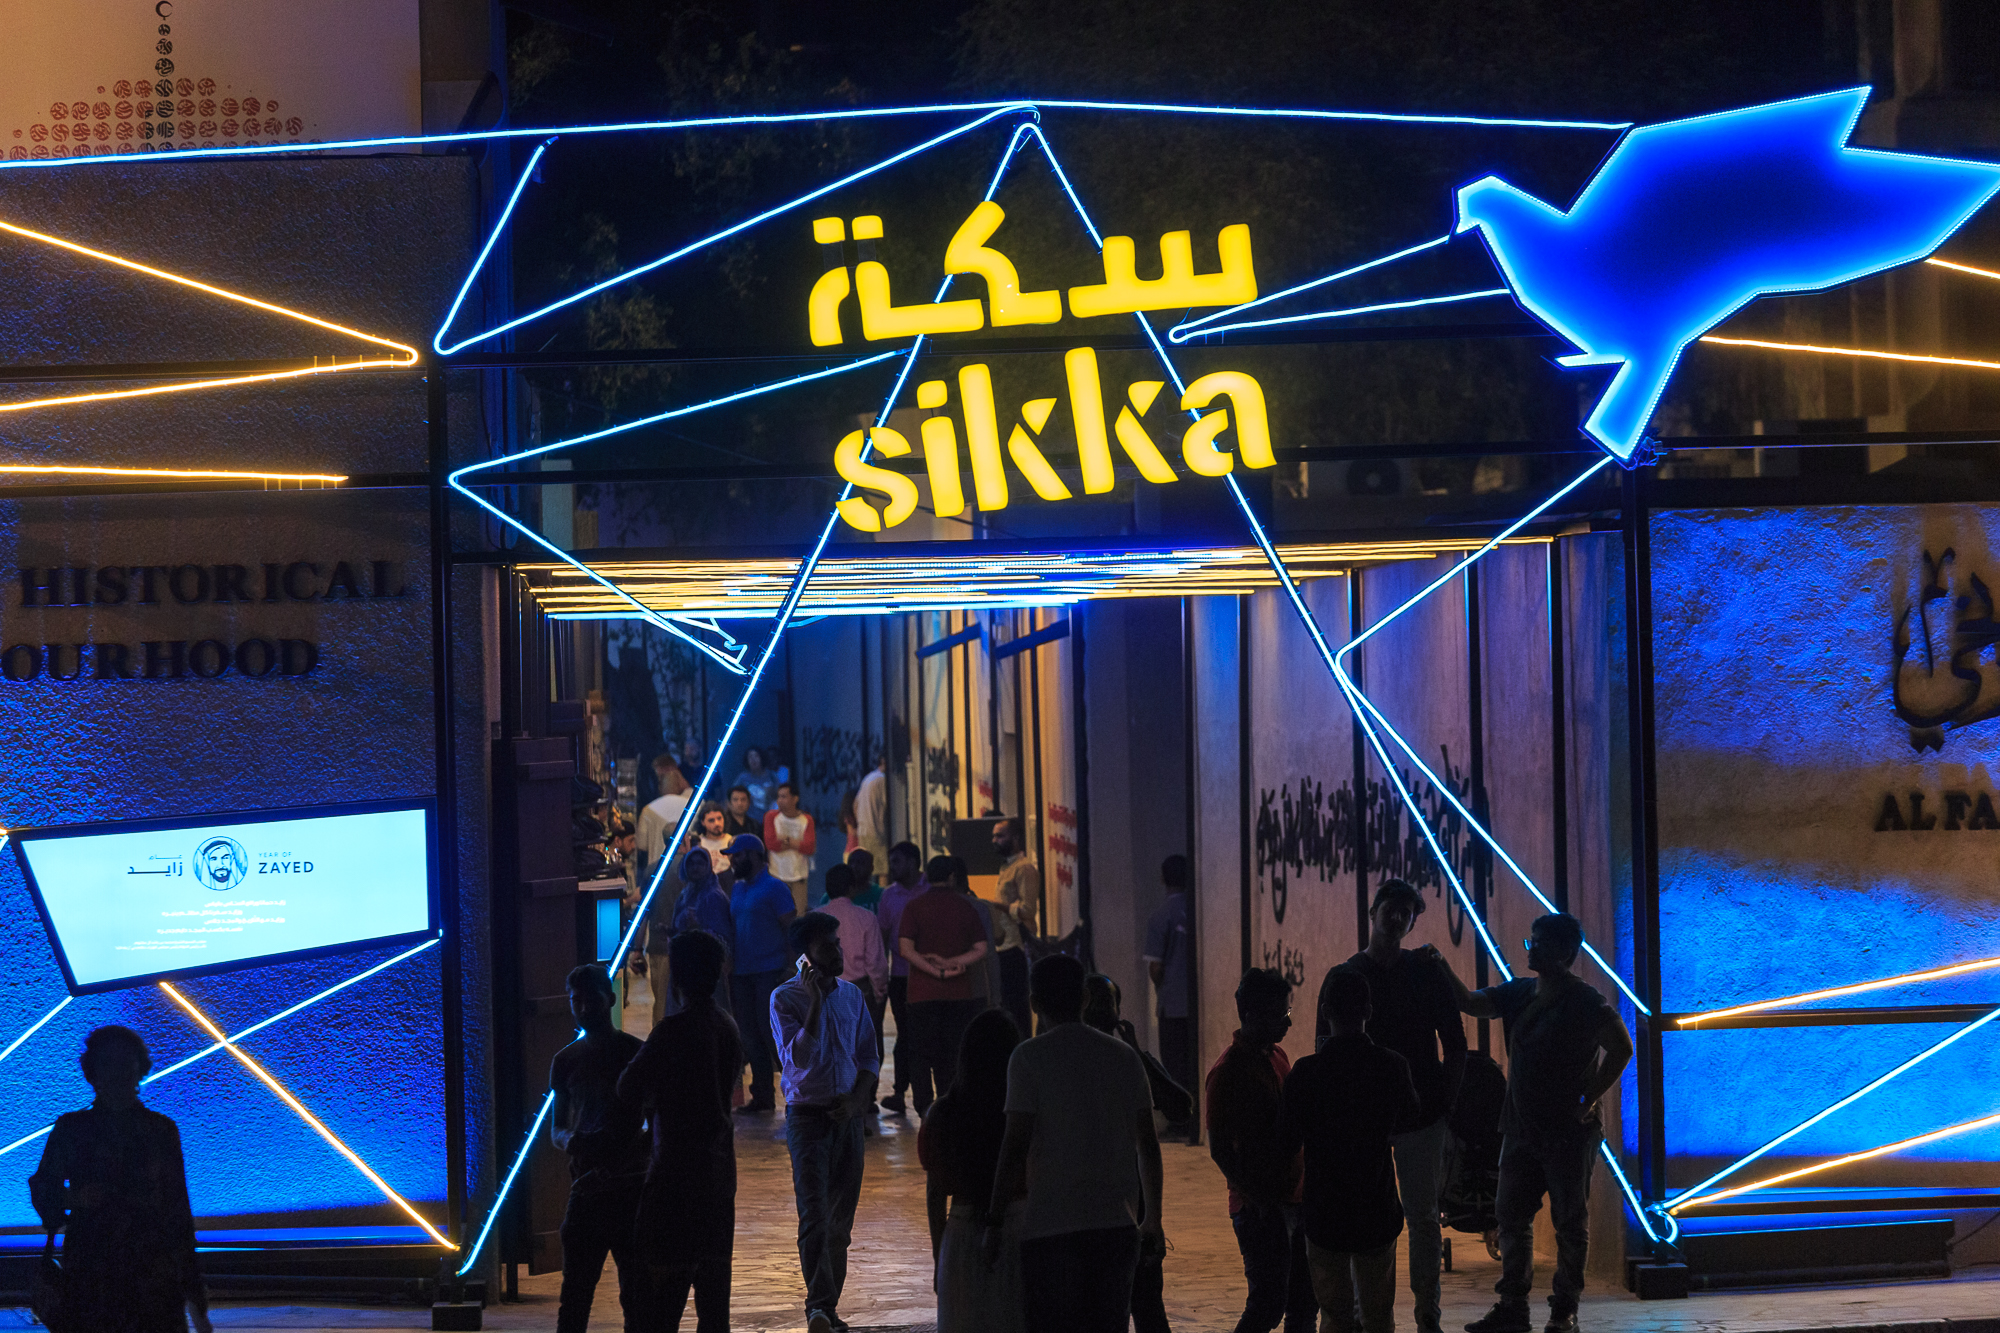 Sikka 2018 - Alleys Busy.jpg